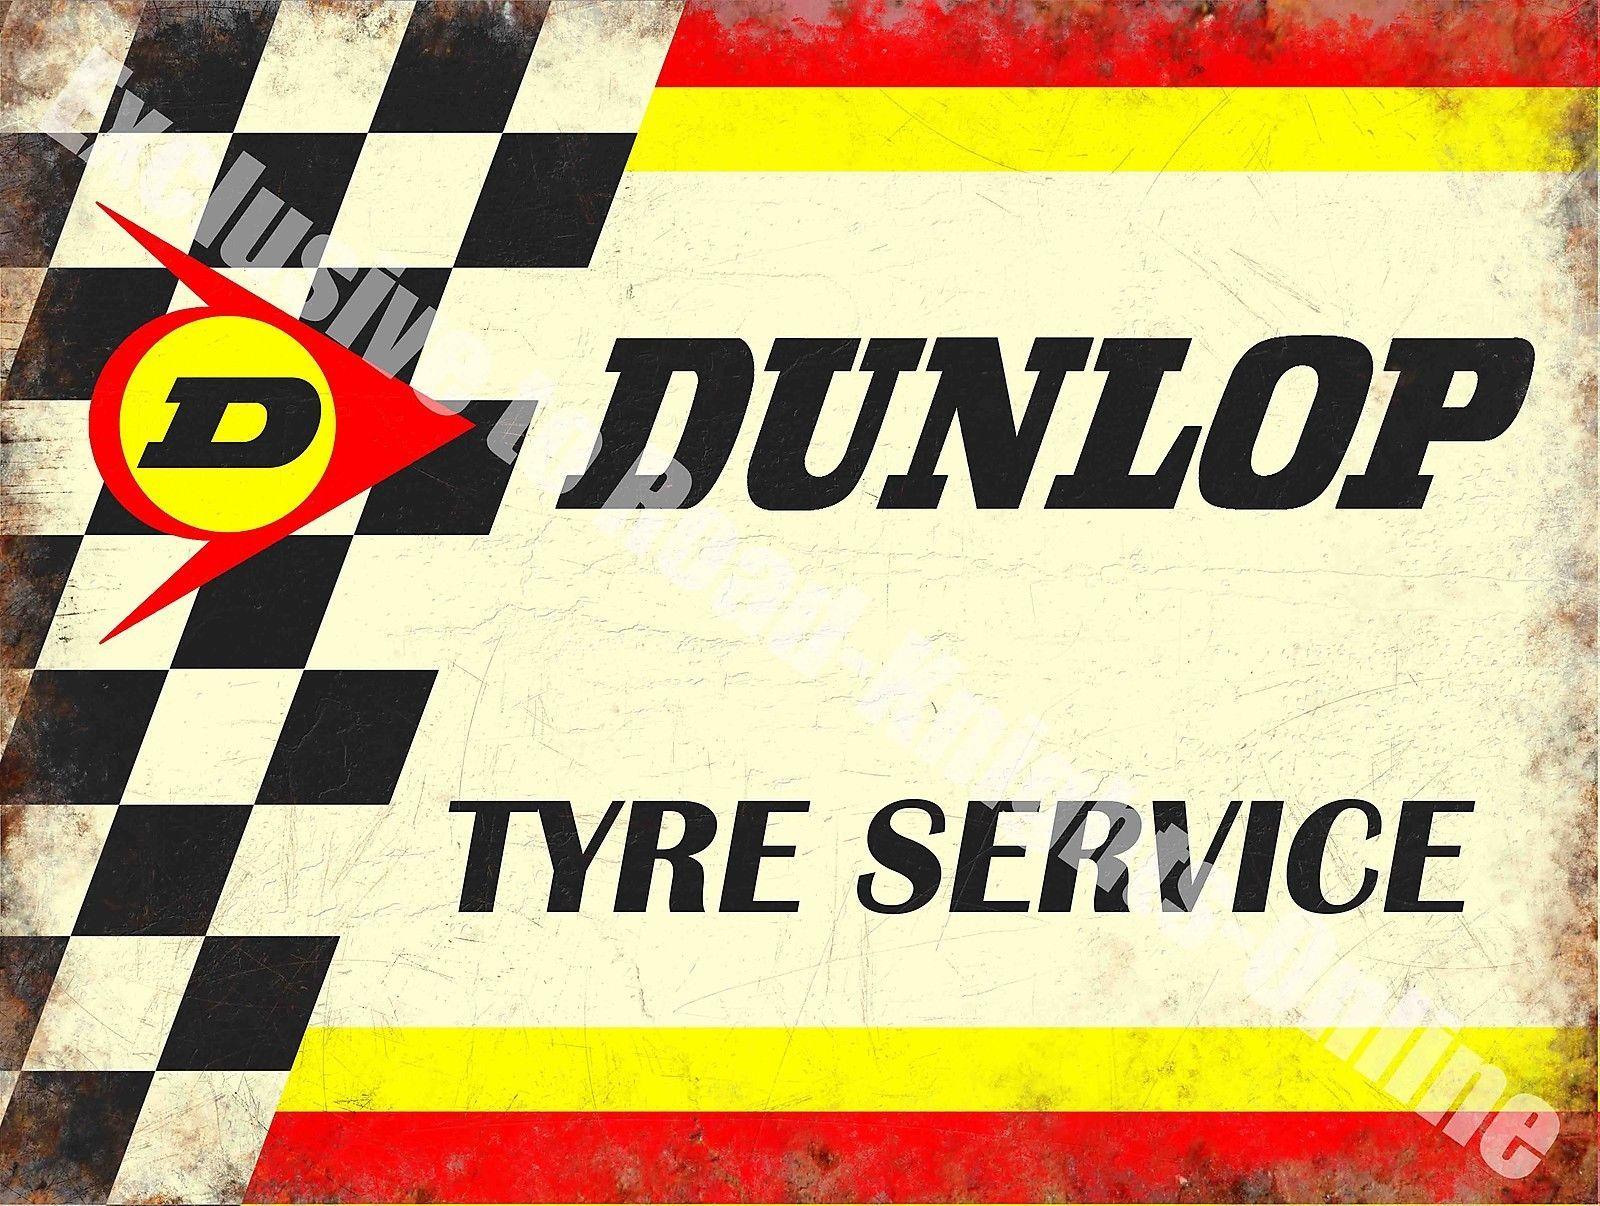 Vintage Garage Dunlop Tyres Motorsport Car 154 Racing Old Large Metal Tin Sign Dunlop Tyres Dunlop Tire [ 1206 x 1600 Pixel ]